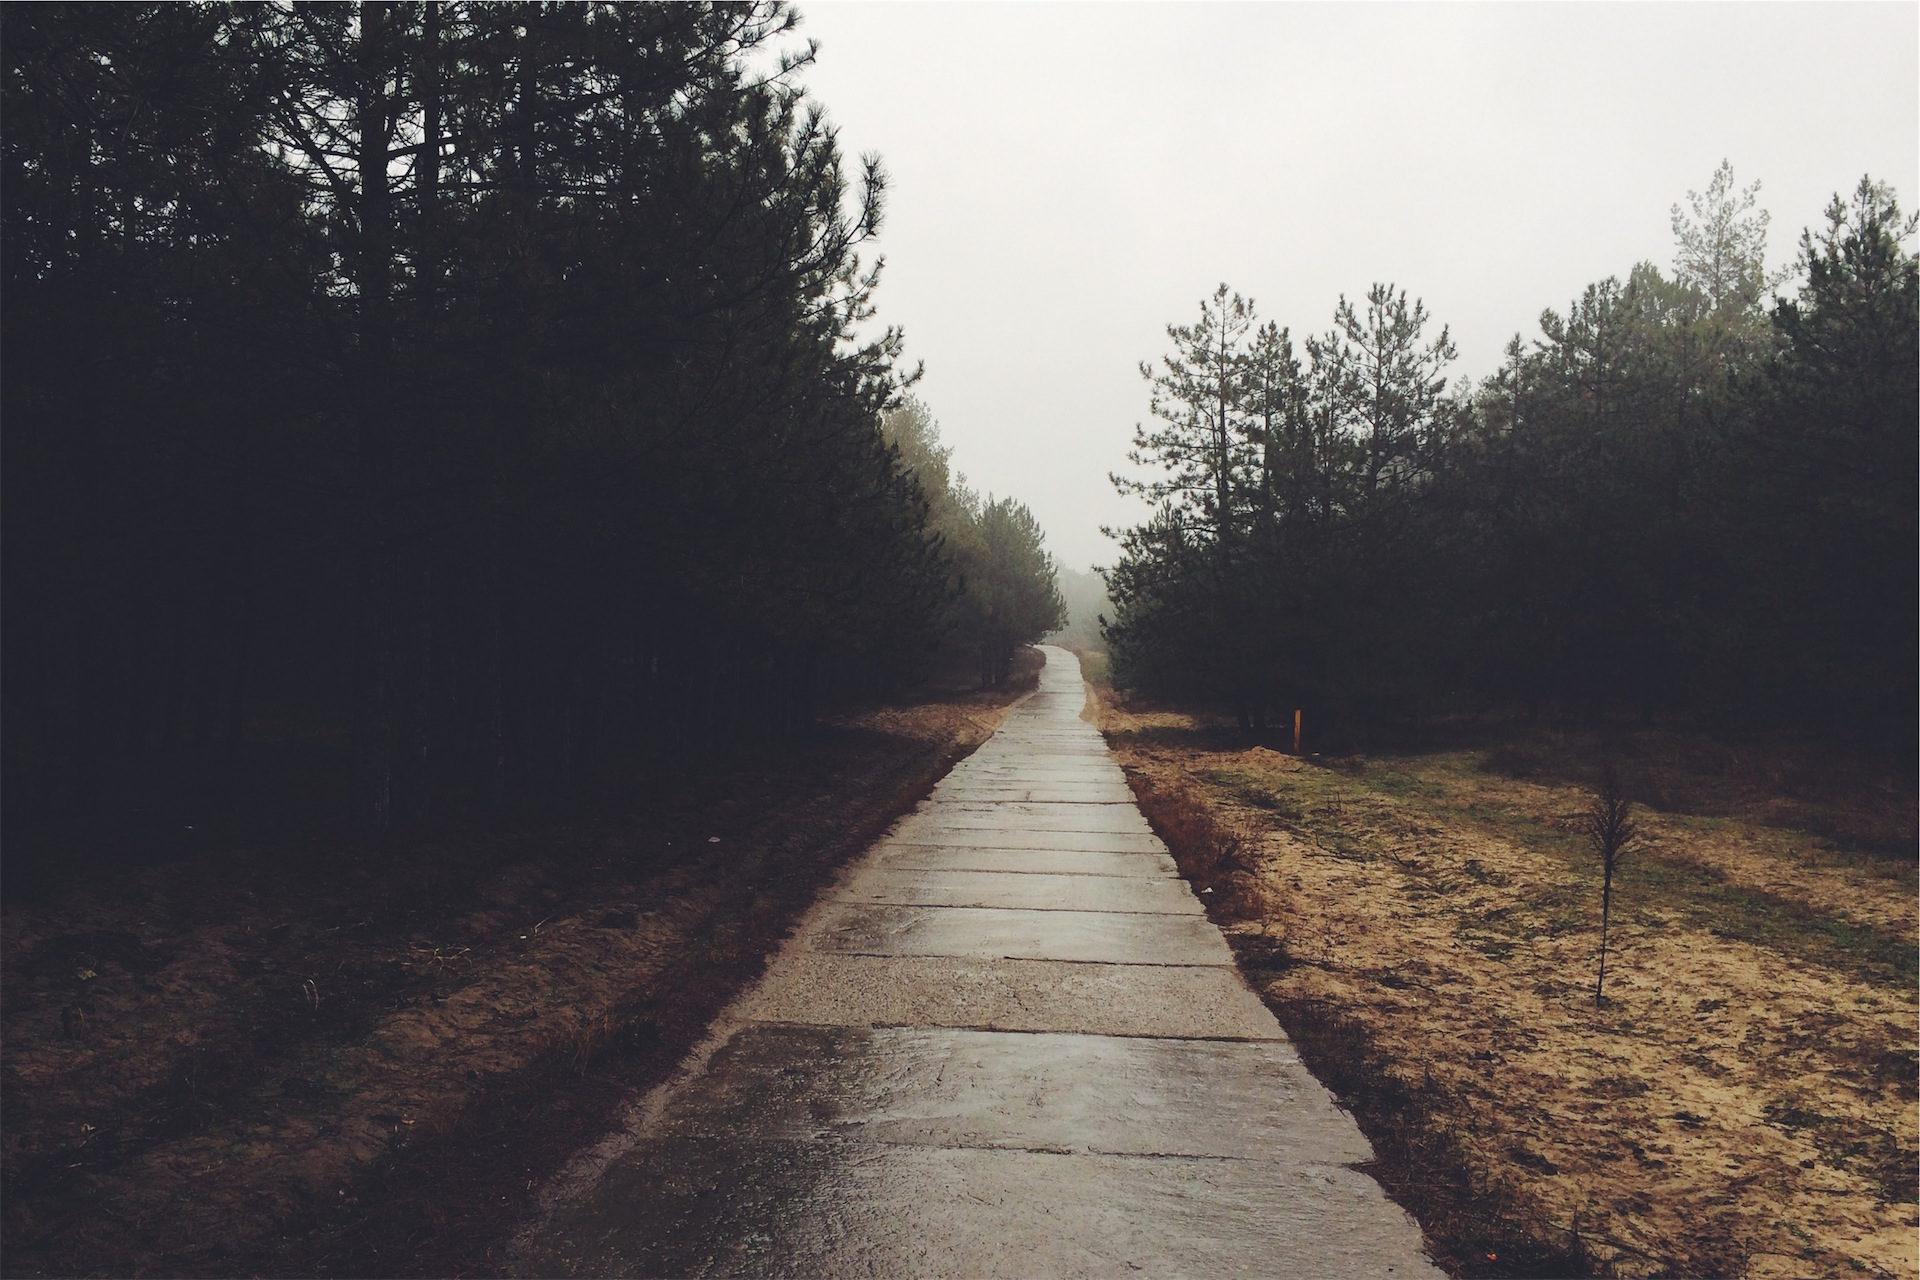 camino, niebla, bosque, soledad, relax - Fondos de Pantalla HD - professor-falken.com